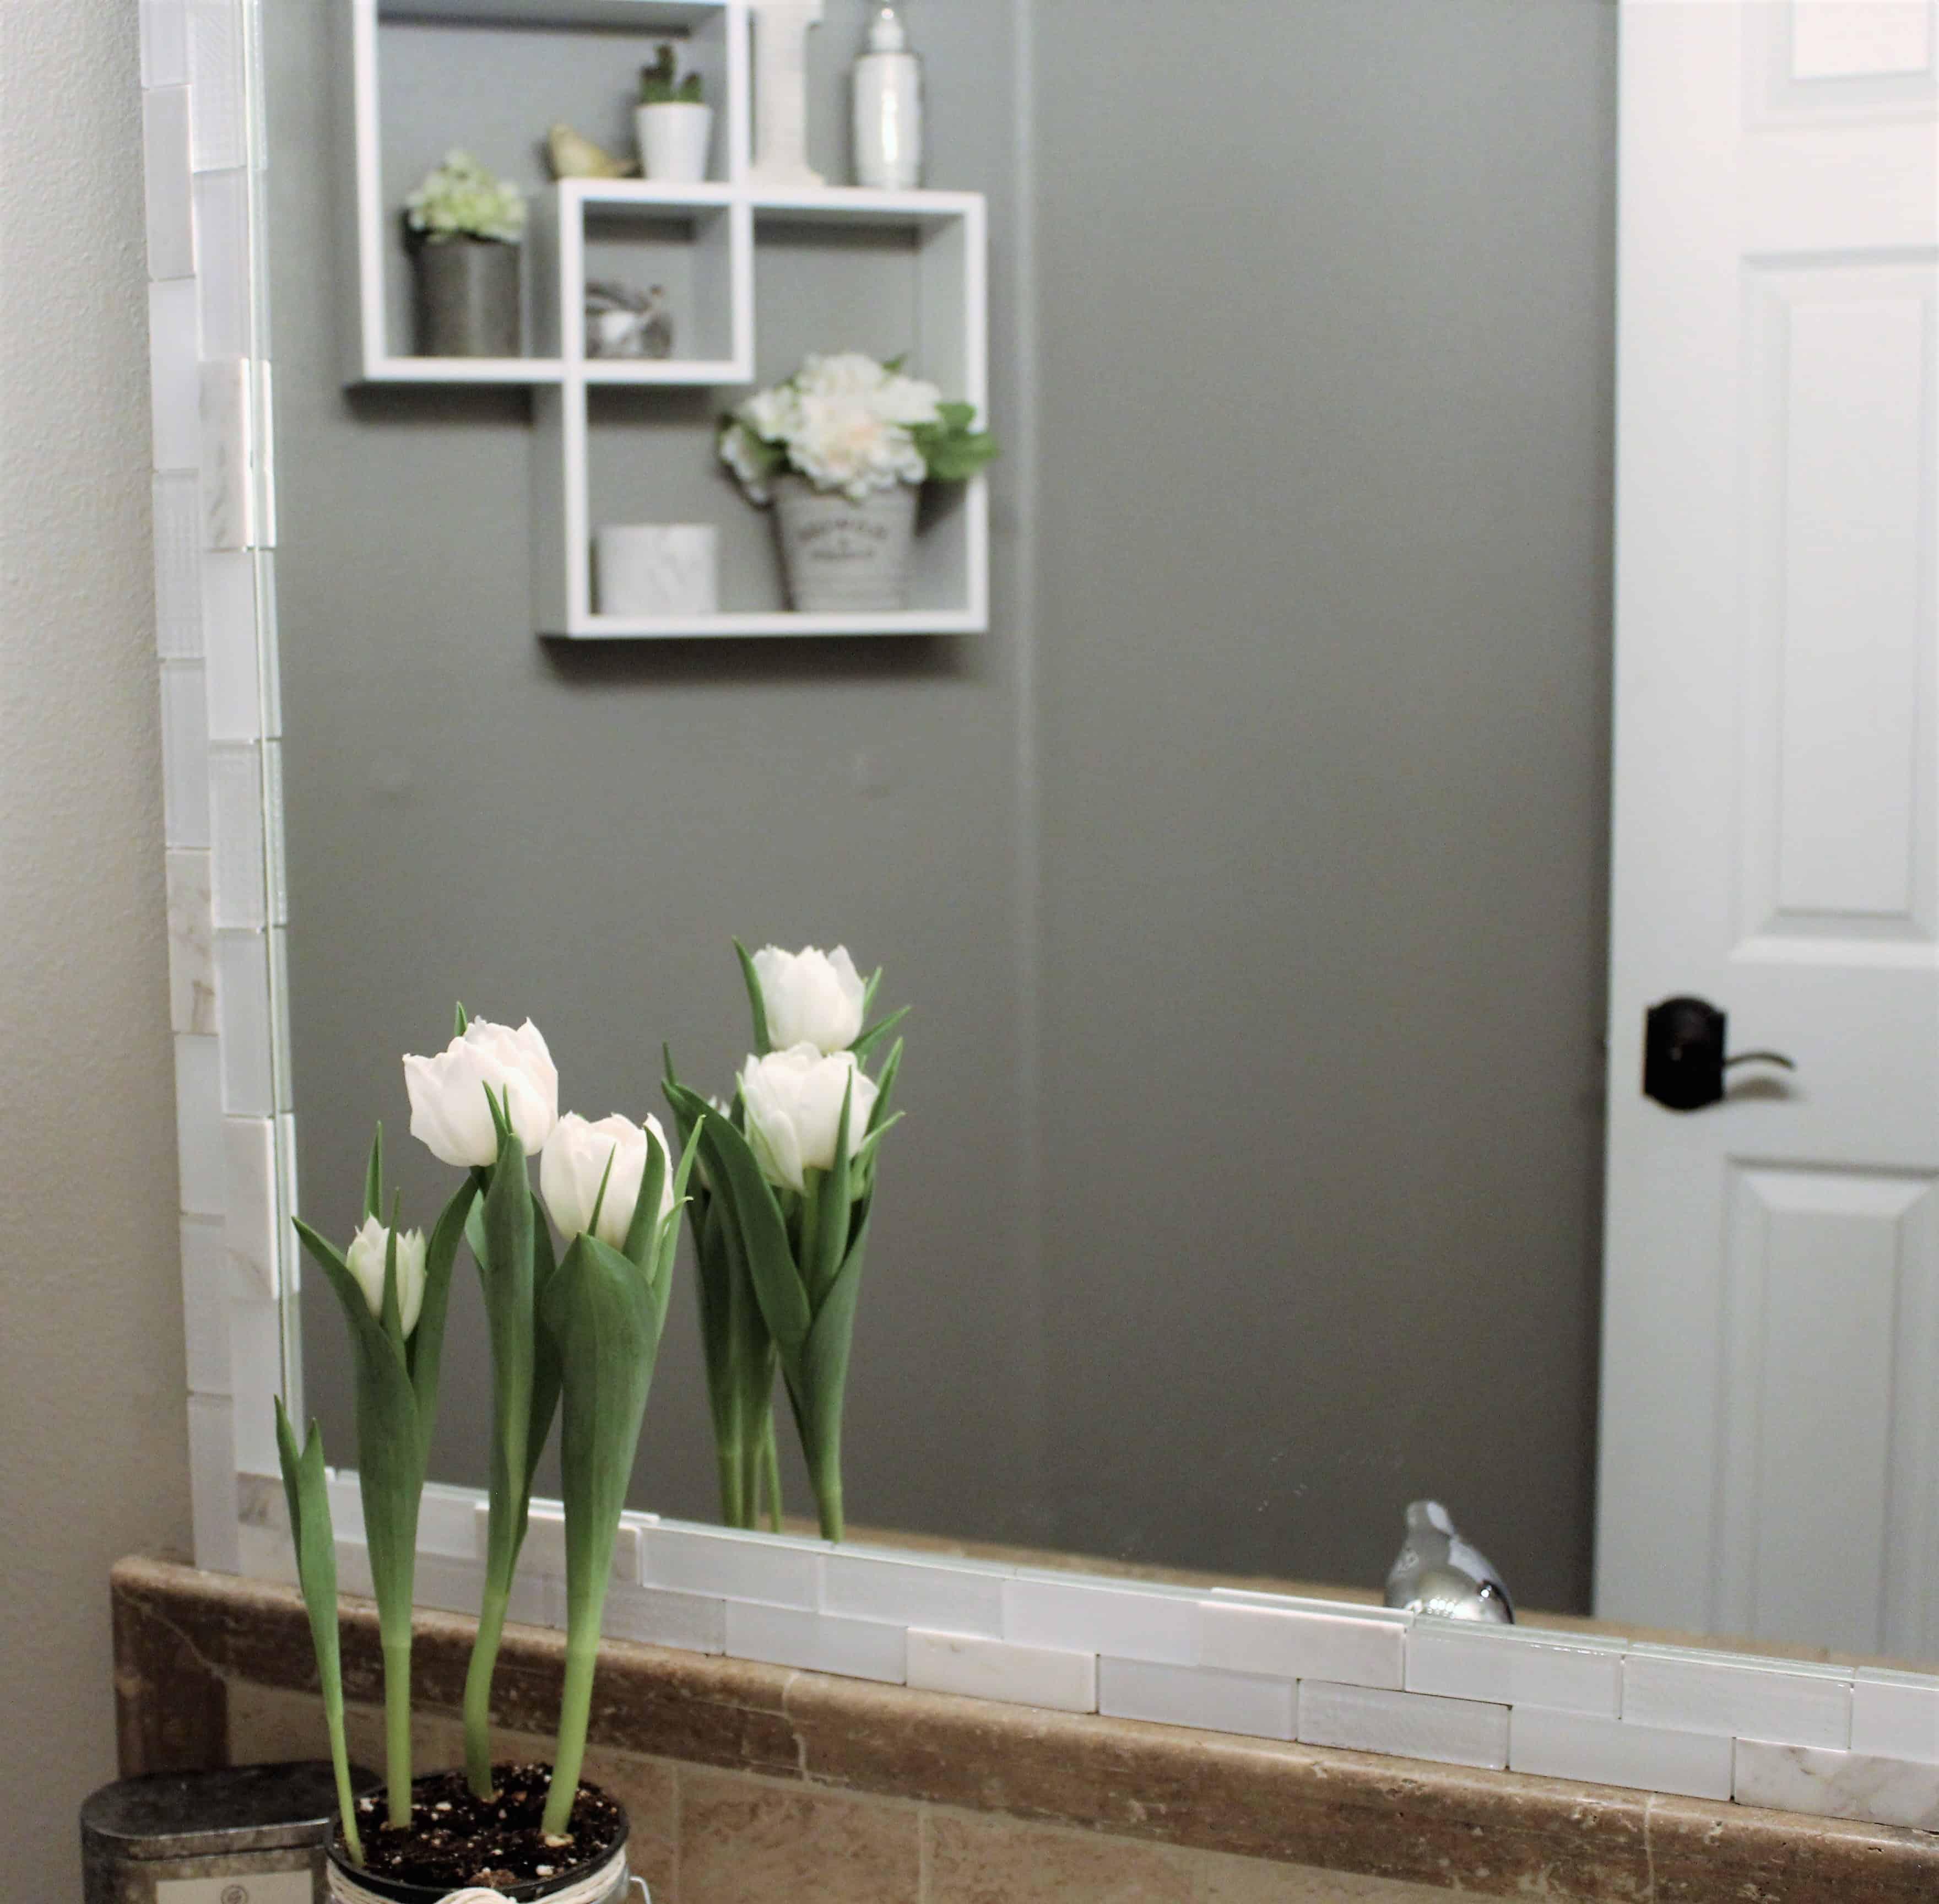 Easy Farmhouse Diy Bathroom Makeover In One Day Under 300